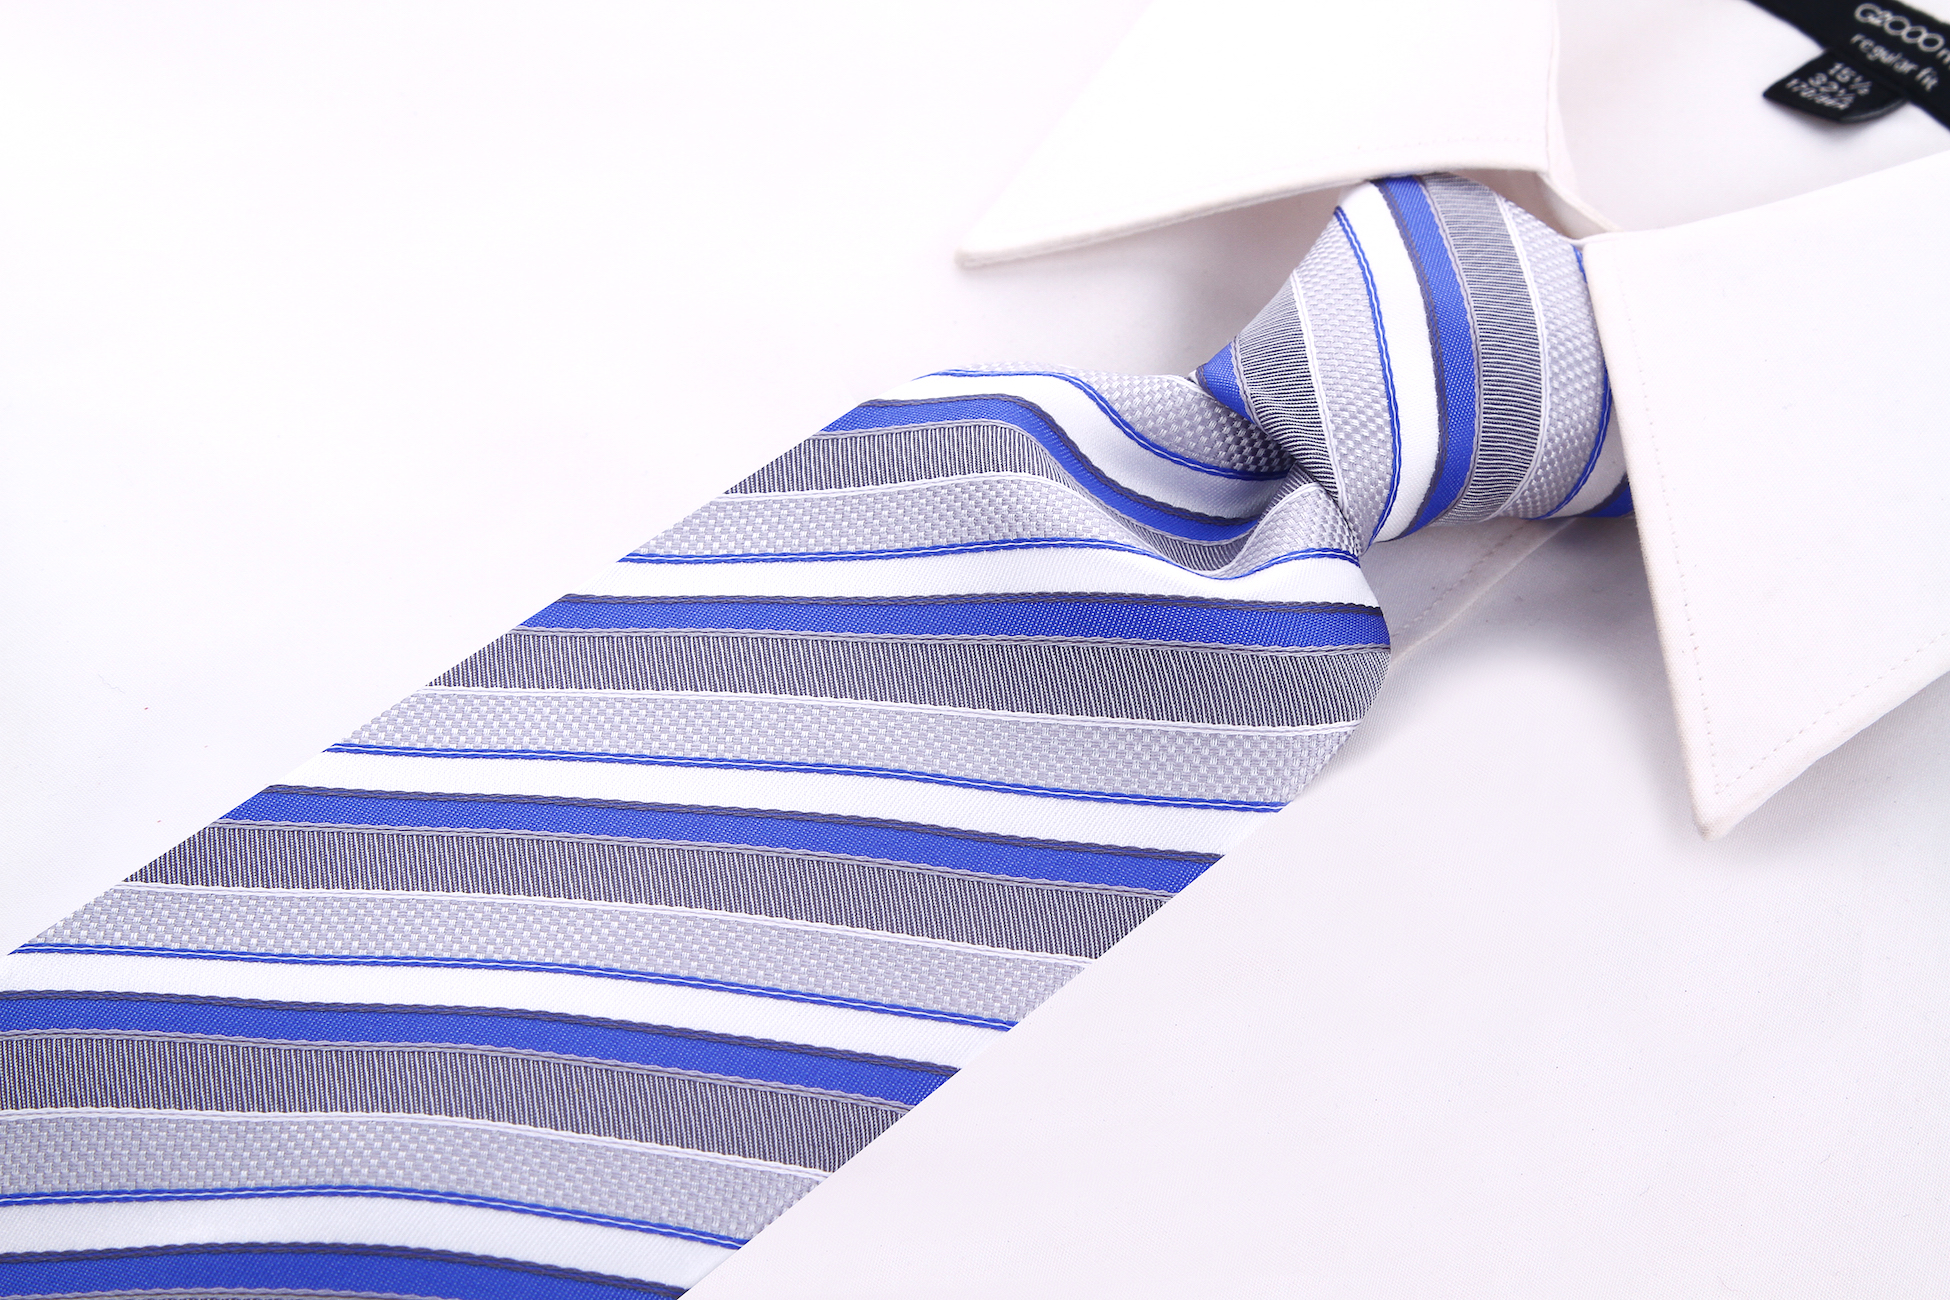 Scott-Allan-Striped-Necktie-Mens-Ties-in-Various-Colors thumbnail 29